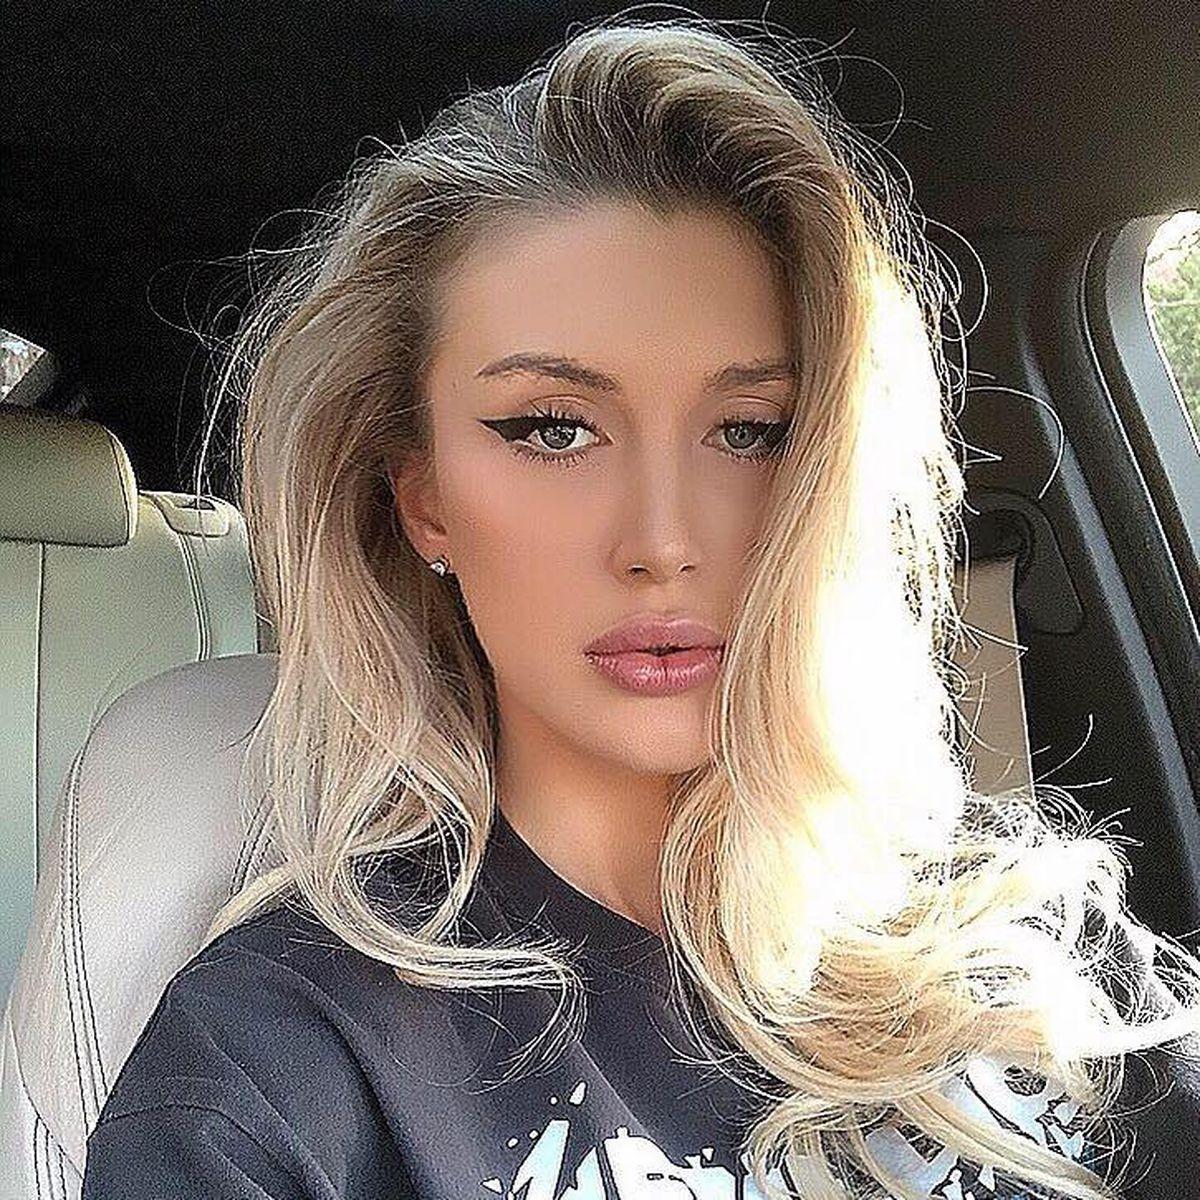 Ioana Marcu